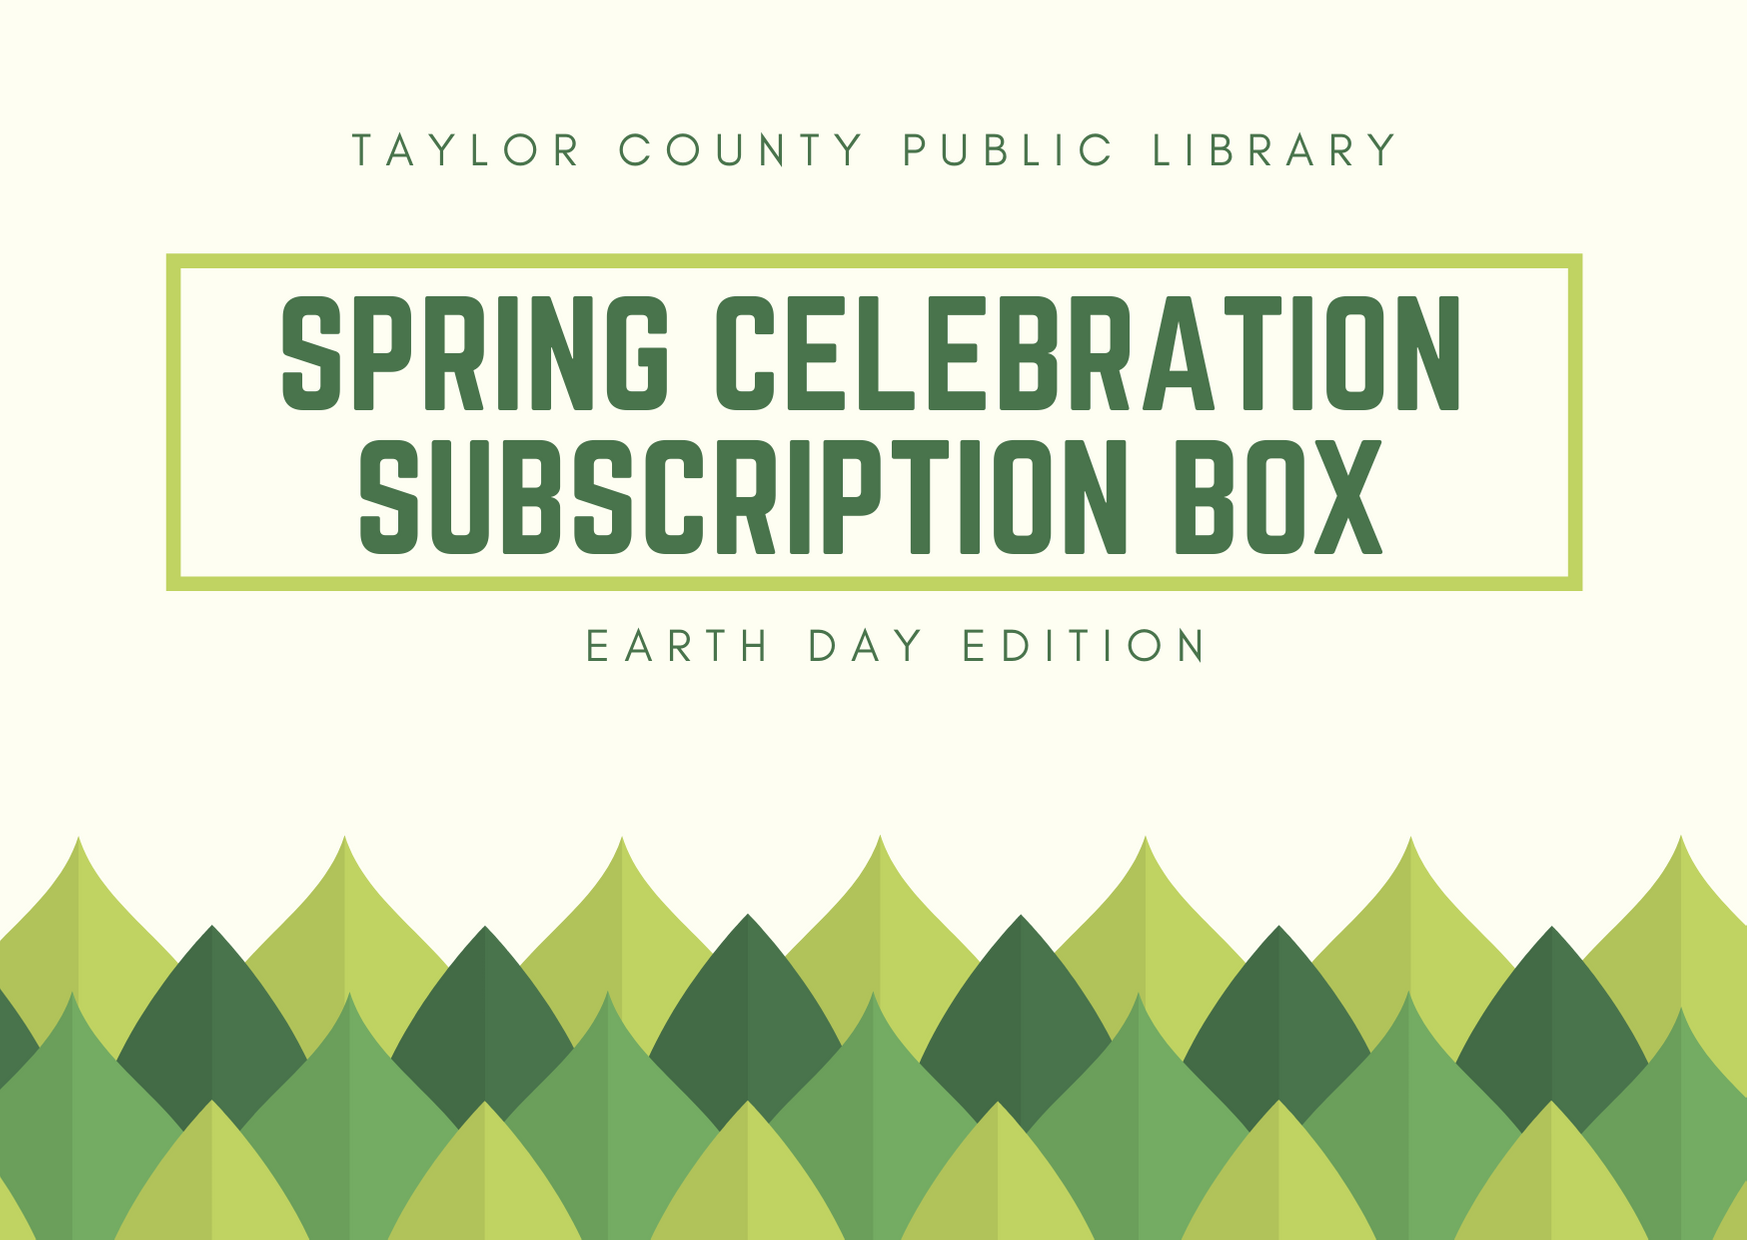 Spring Celebration Subscription Box